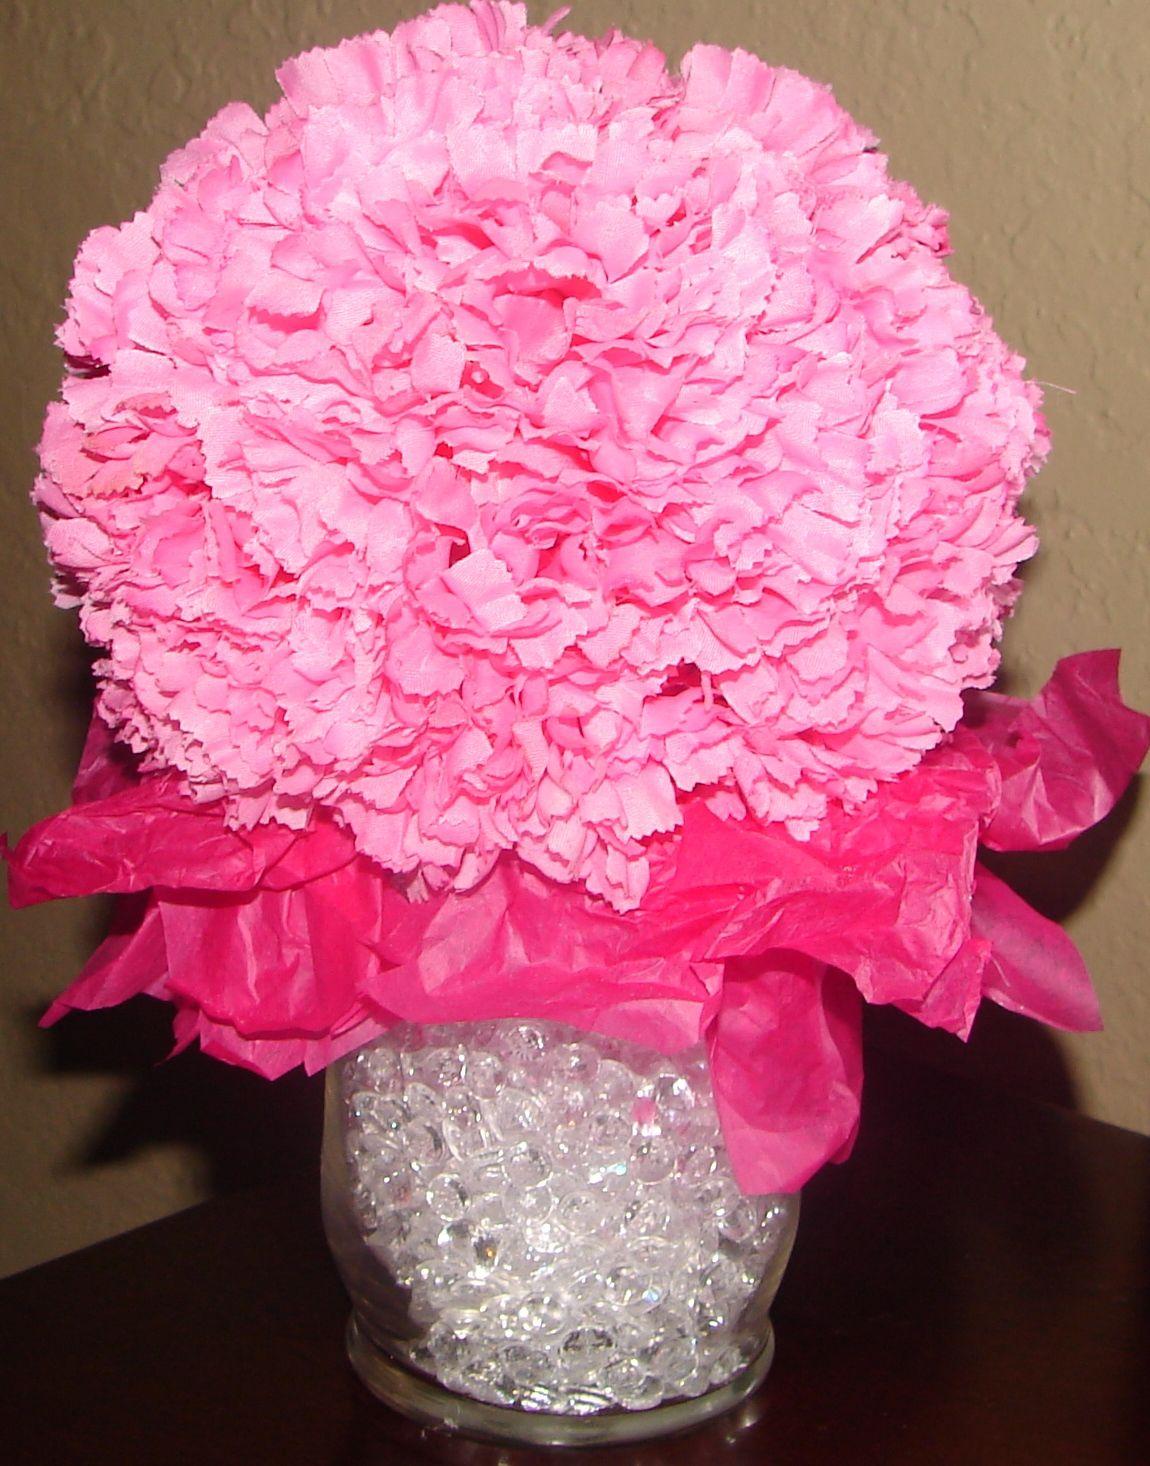 Pink carnation pomander centerpiece dollar tree vase dollar tree pink carnation pomander centerpiece dollar tree vase dollar tree pink carnations dollar tree tissue paper hobby reviewsmspy